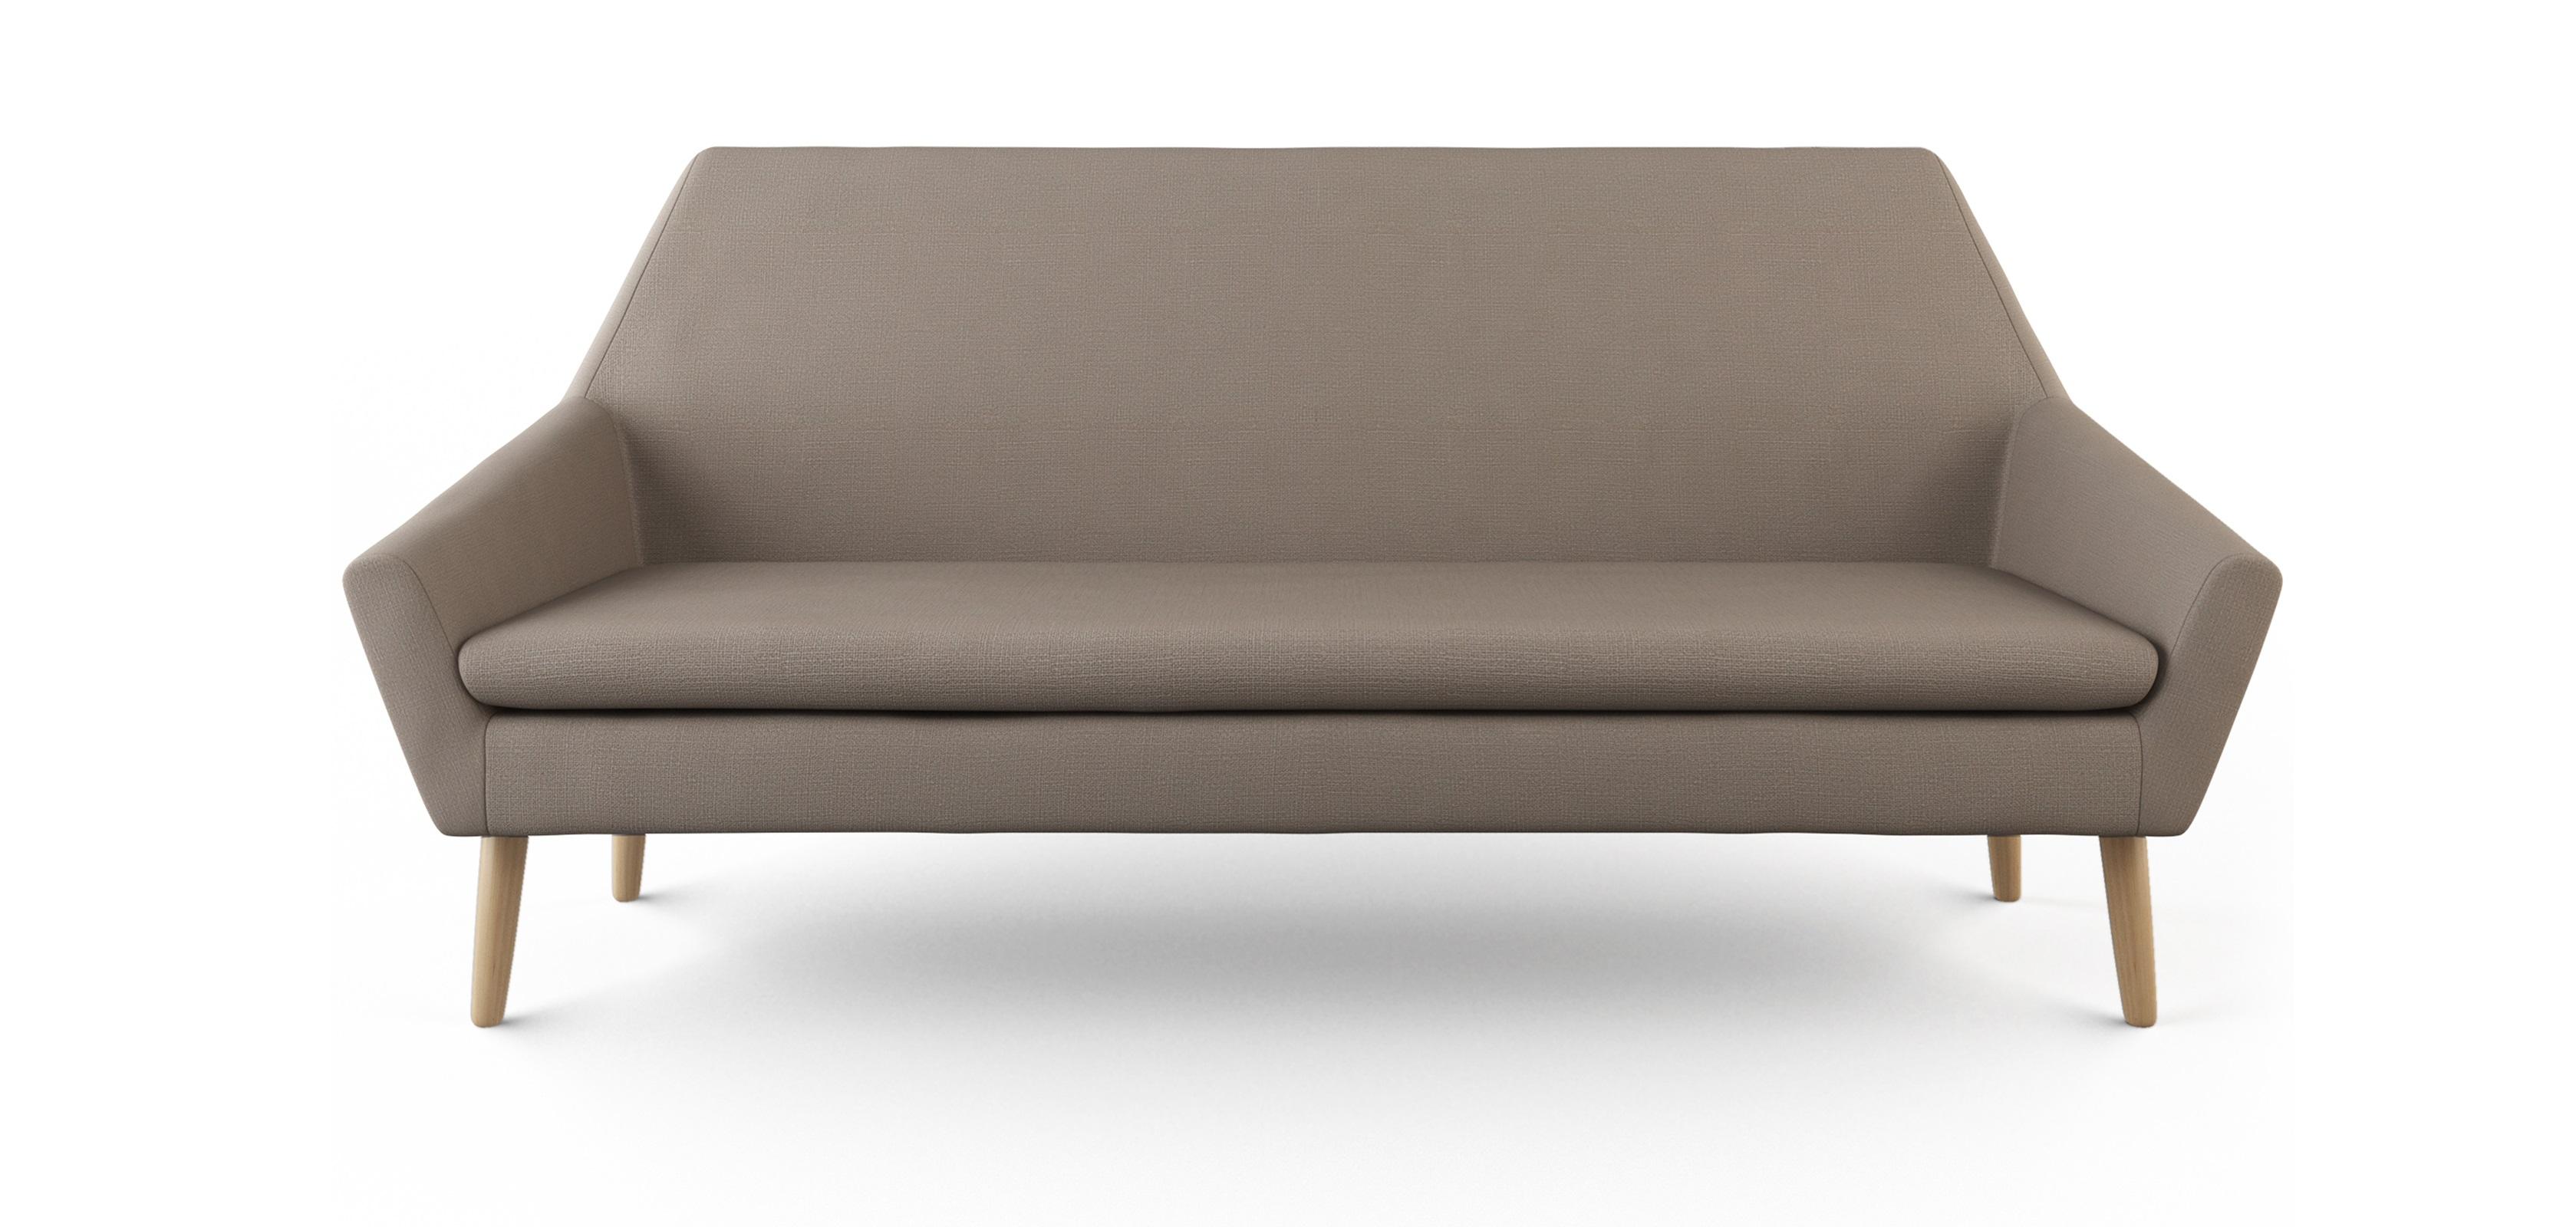 Skandinavisches design sofa 2 Sitzer stoff